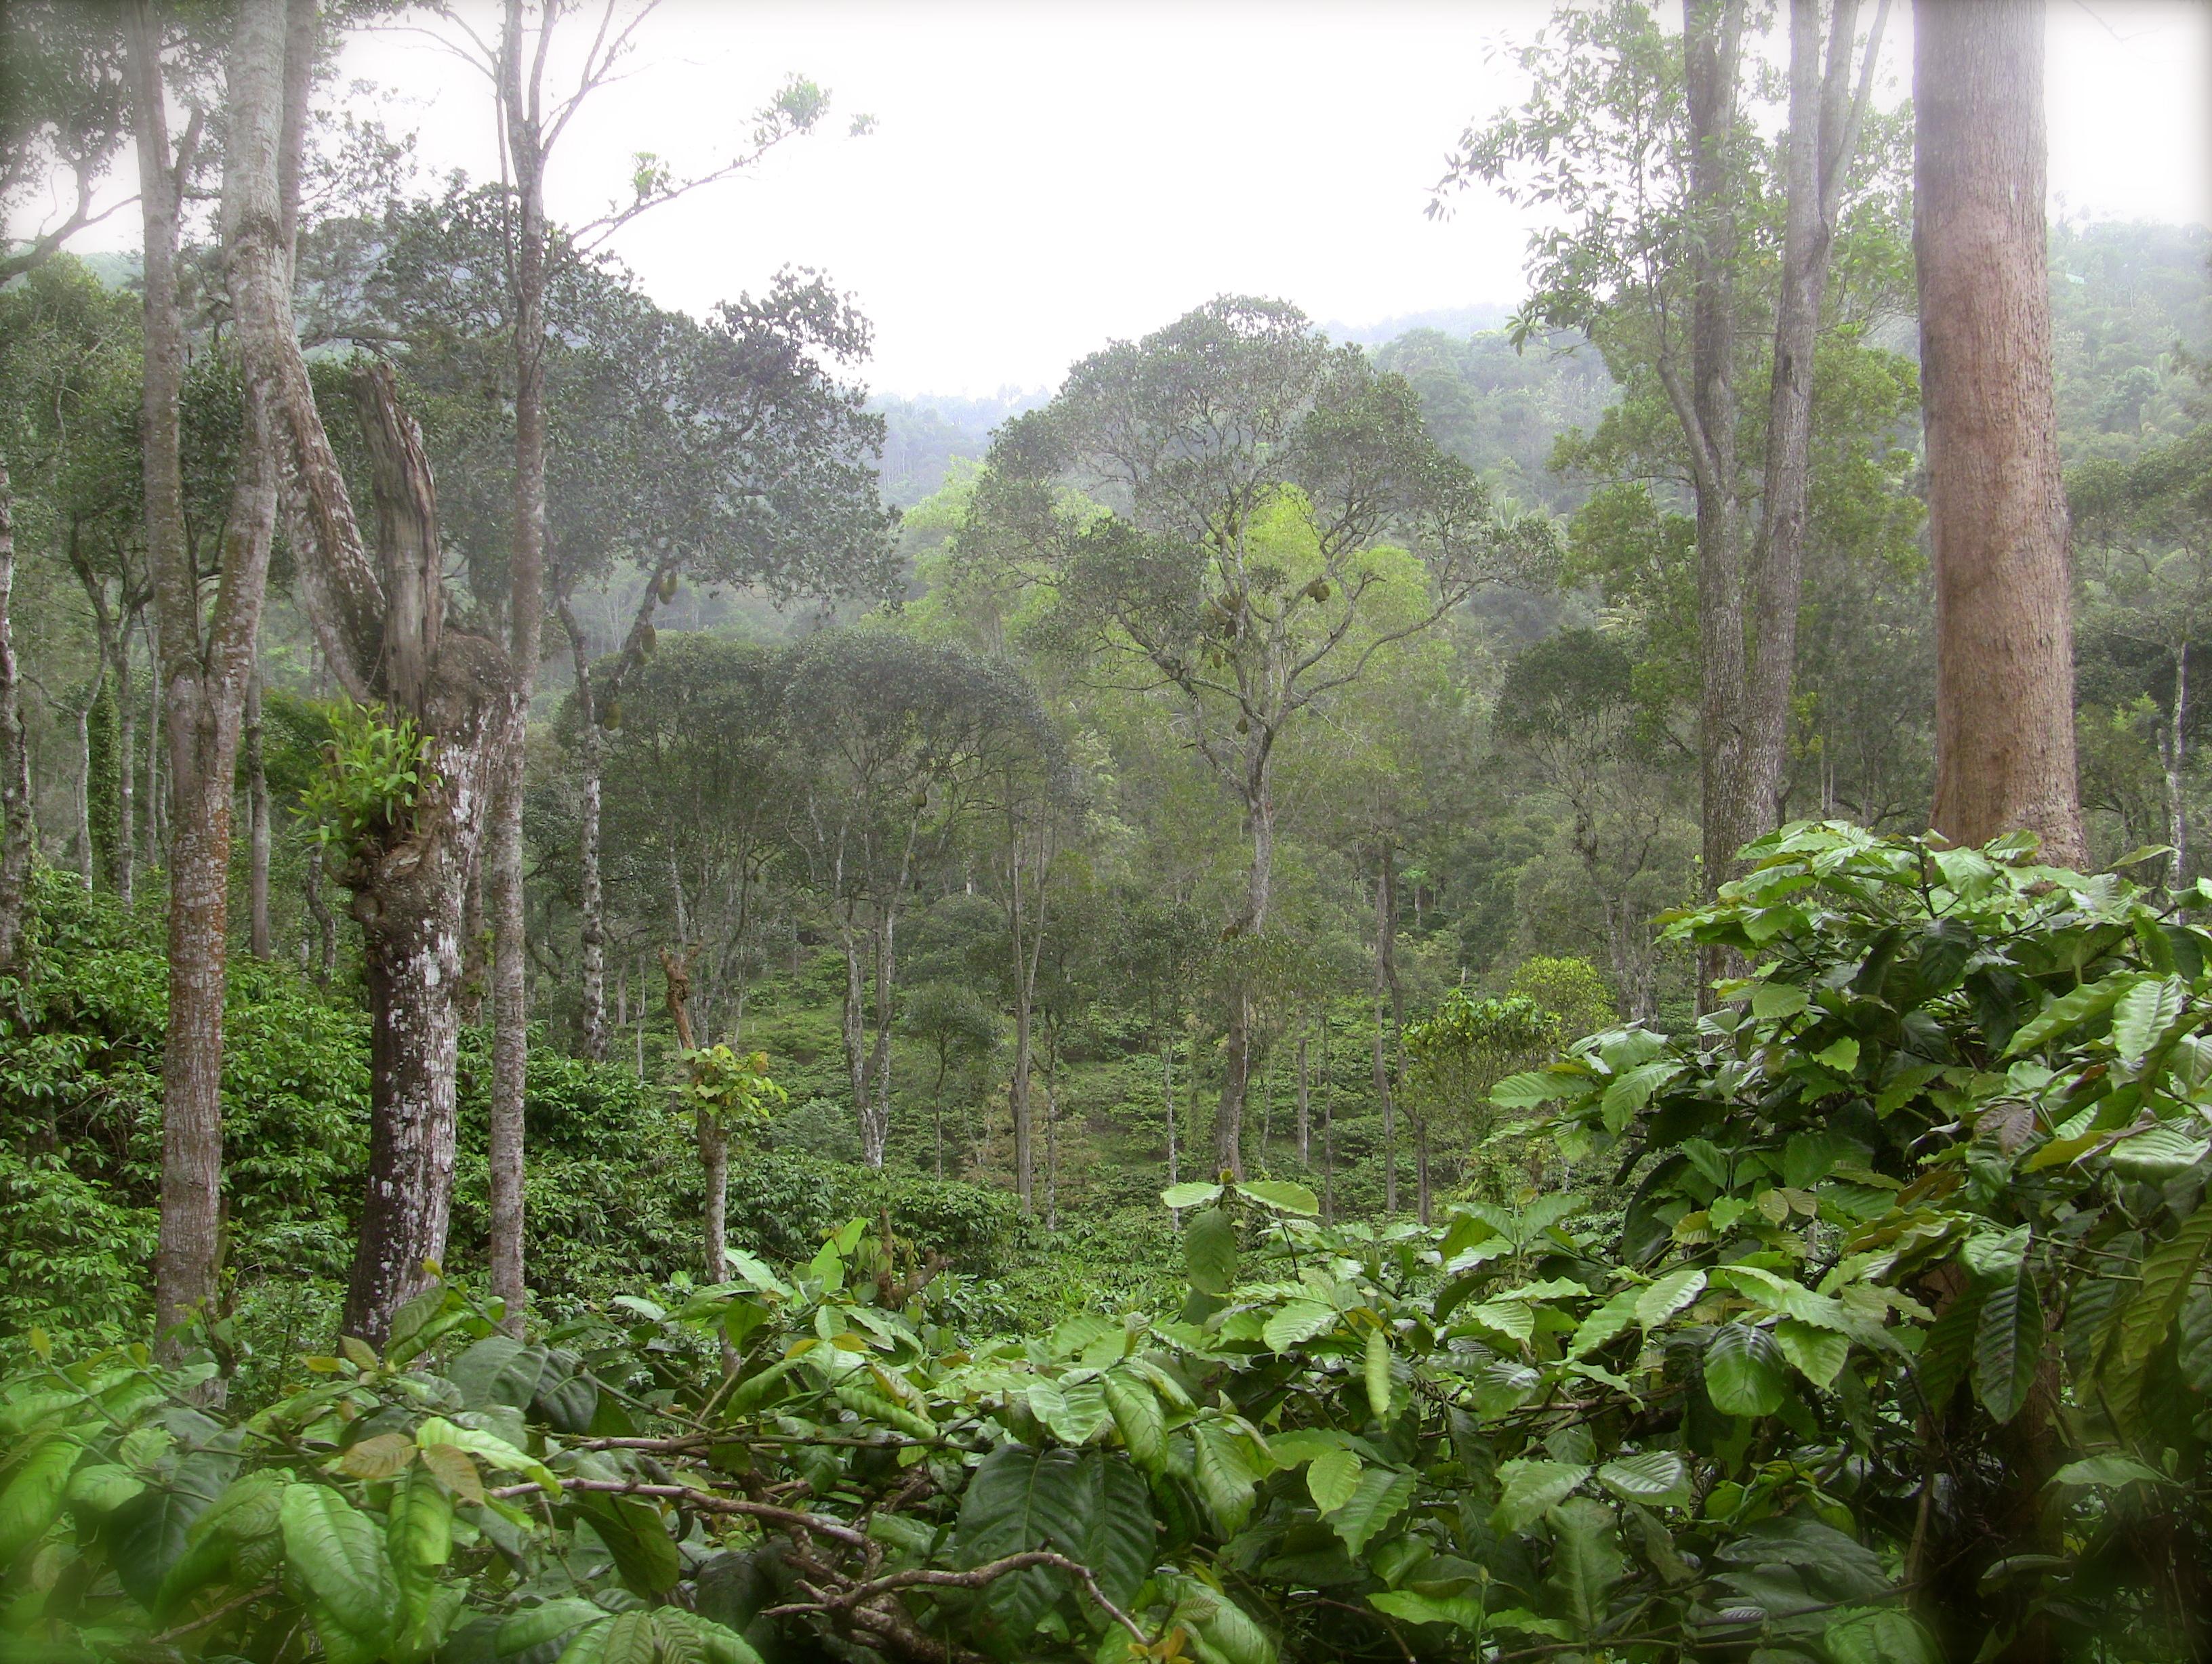 Robusta, Liberian, Arabica: a visit to a coffee plantation ...